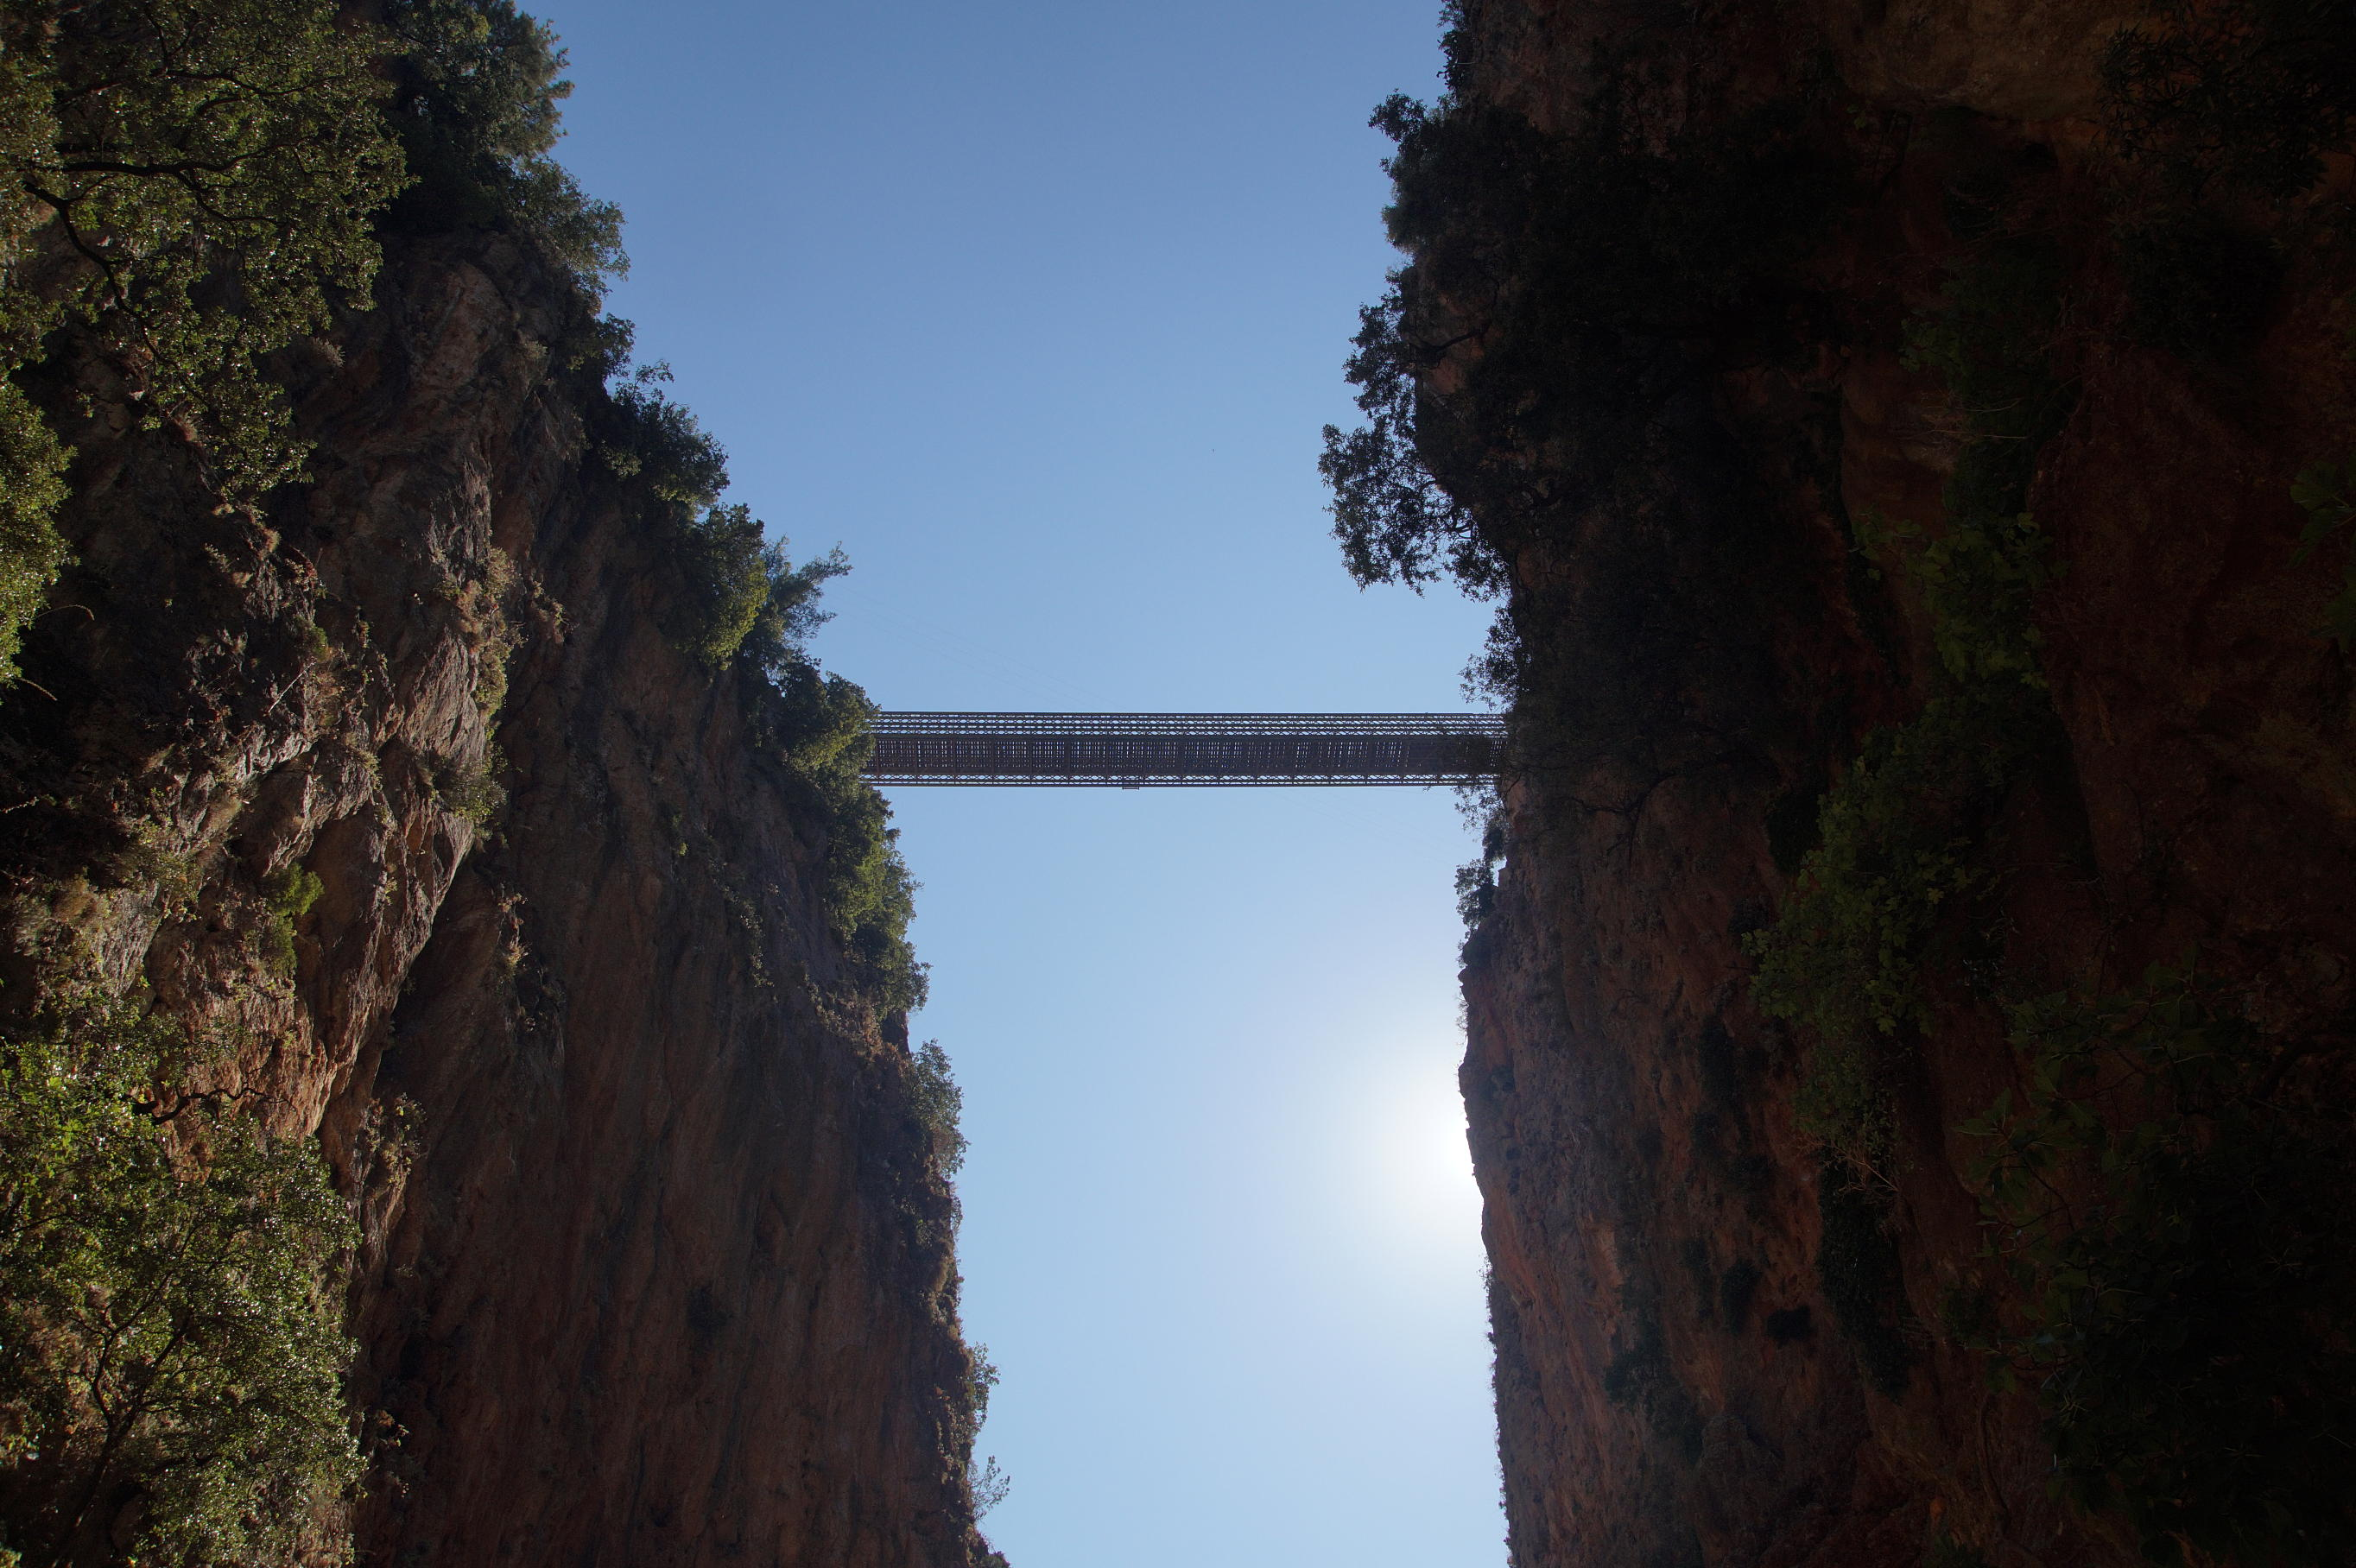 Aradena Gorge Bridge